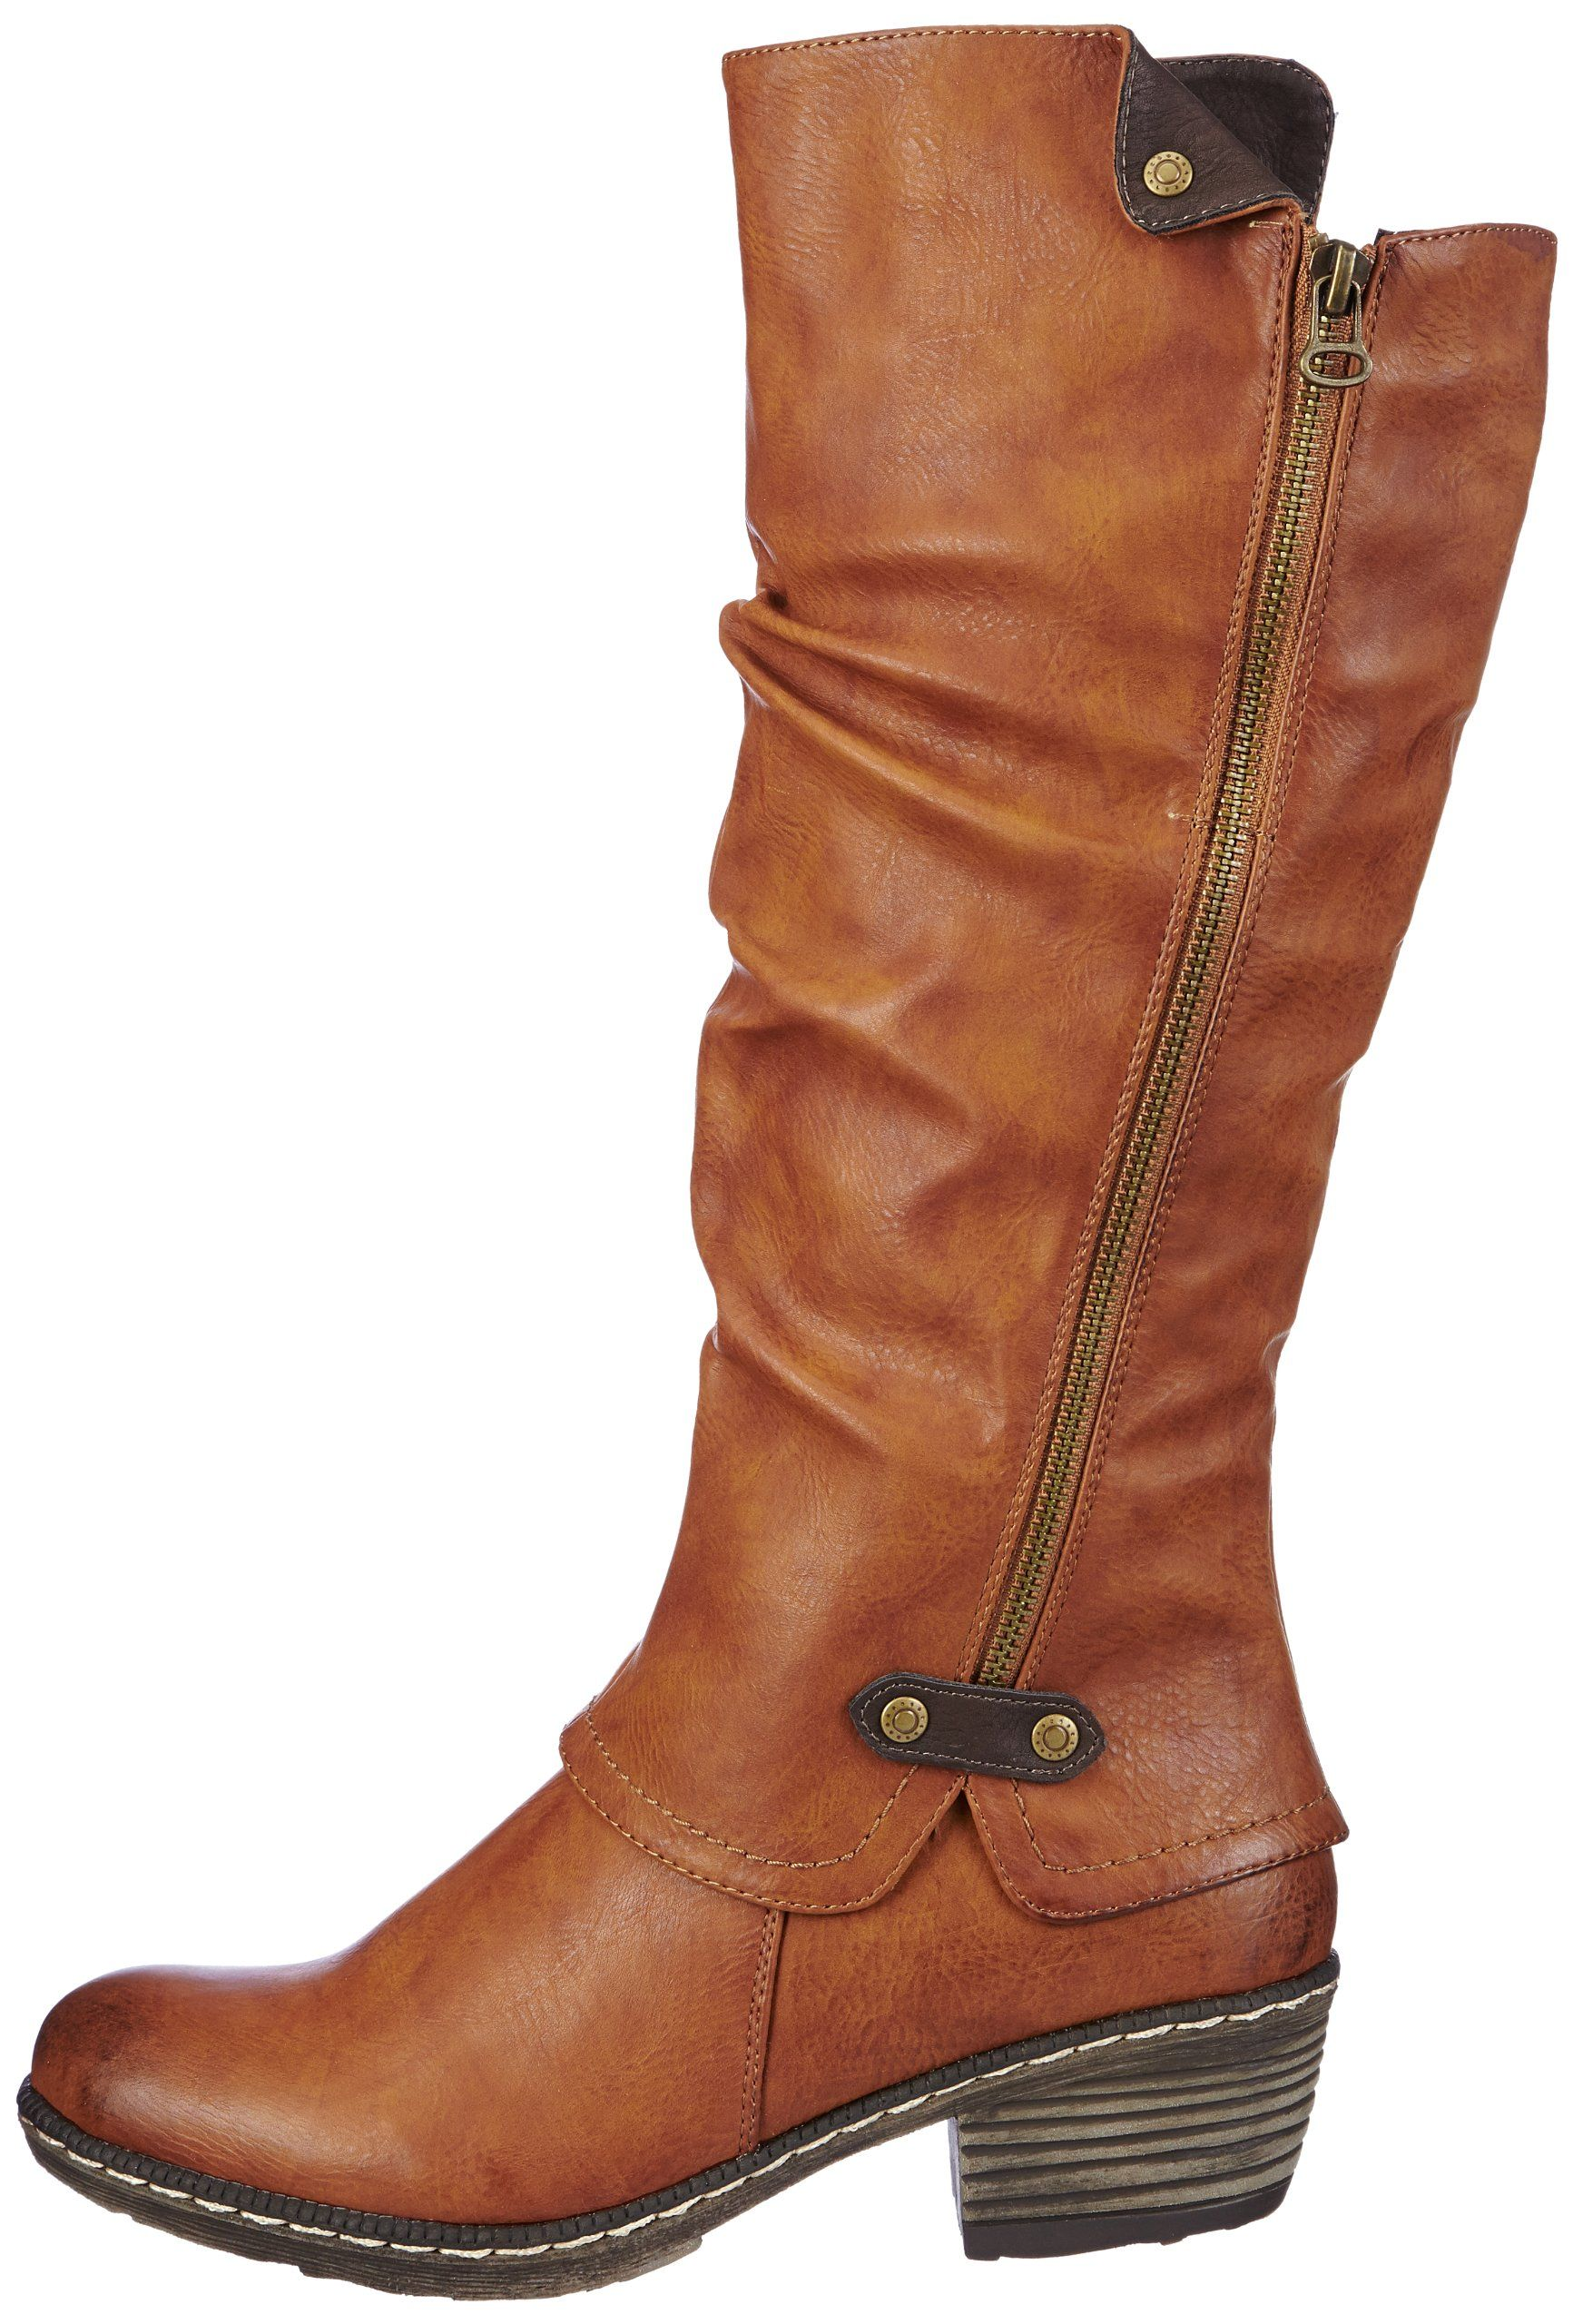 aff5be3db7537 Amazon.com: Rieker Women's Tan Brown Low Heel Tall Boot: Shoes ...